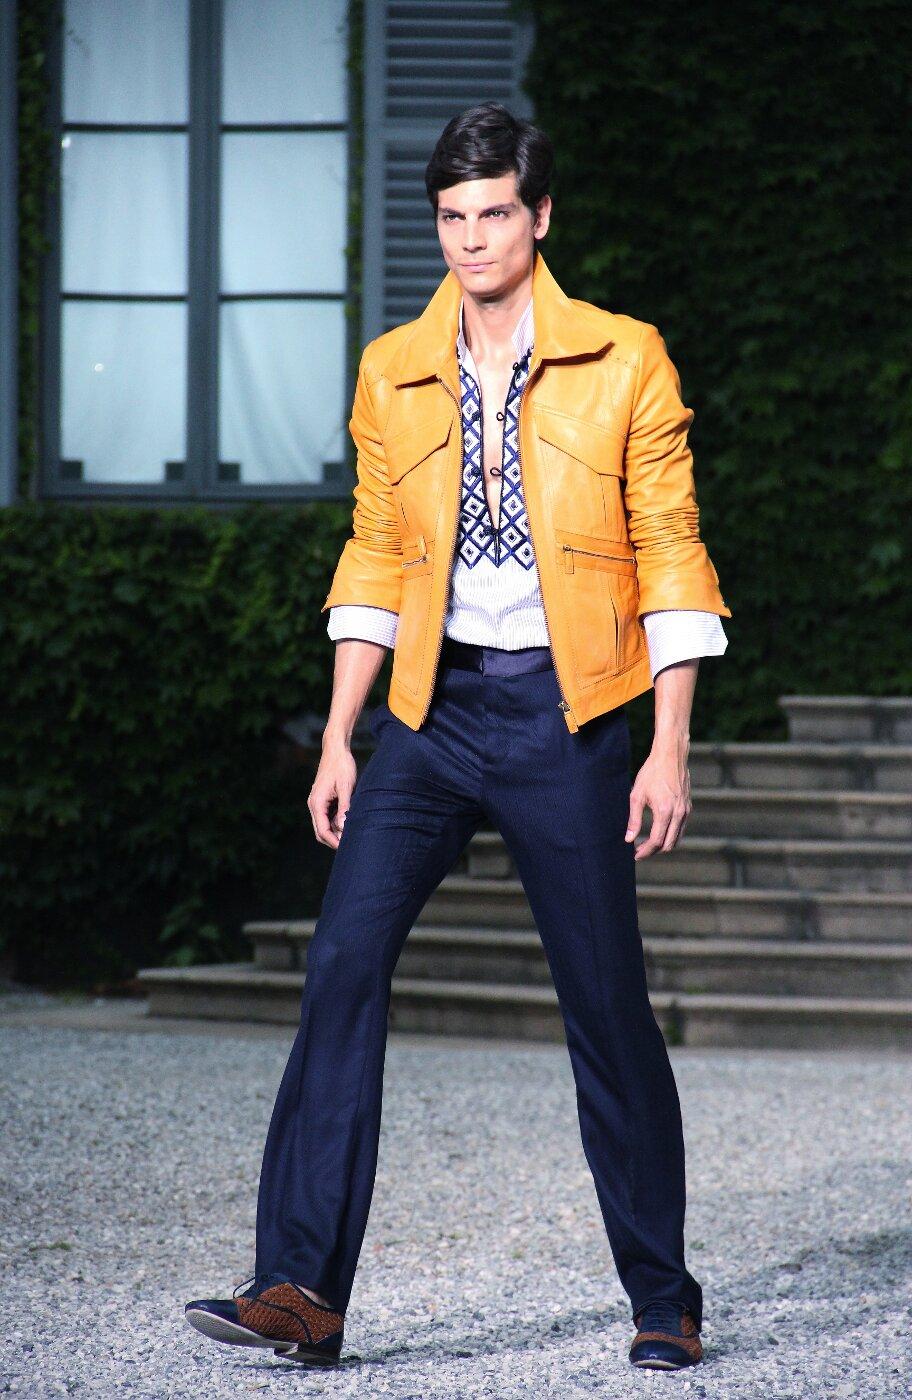 roberto-cavalli-ss-spring-summer-2012-milano-fashion-week-roberto-cavalli